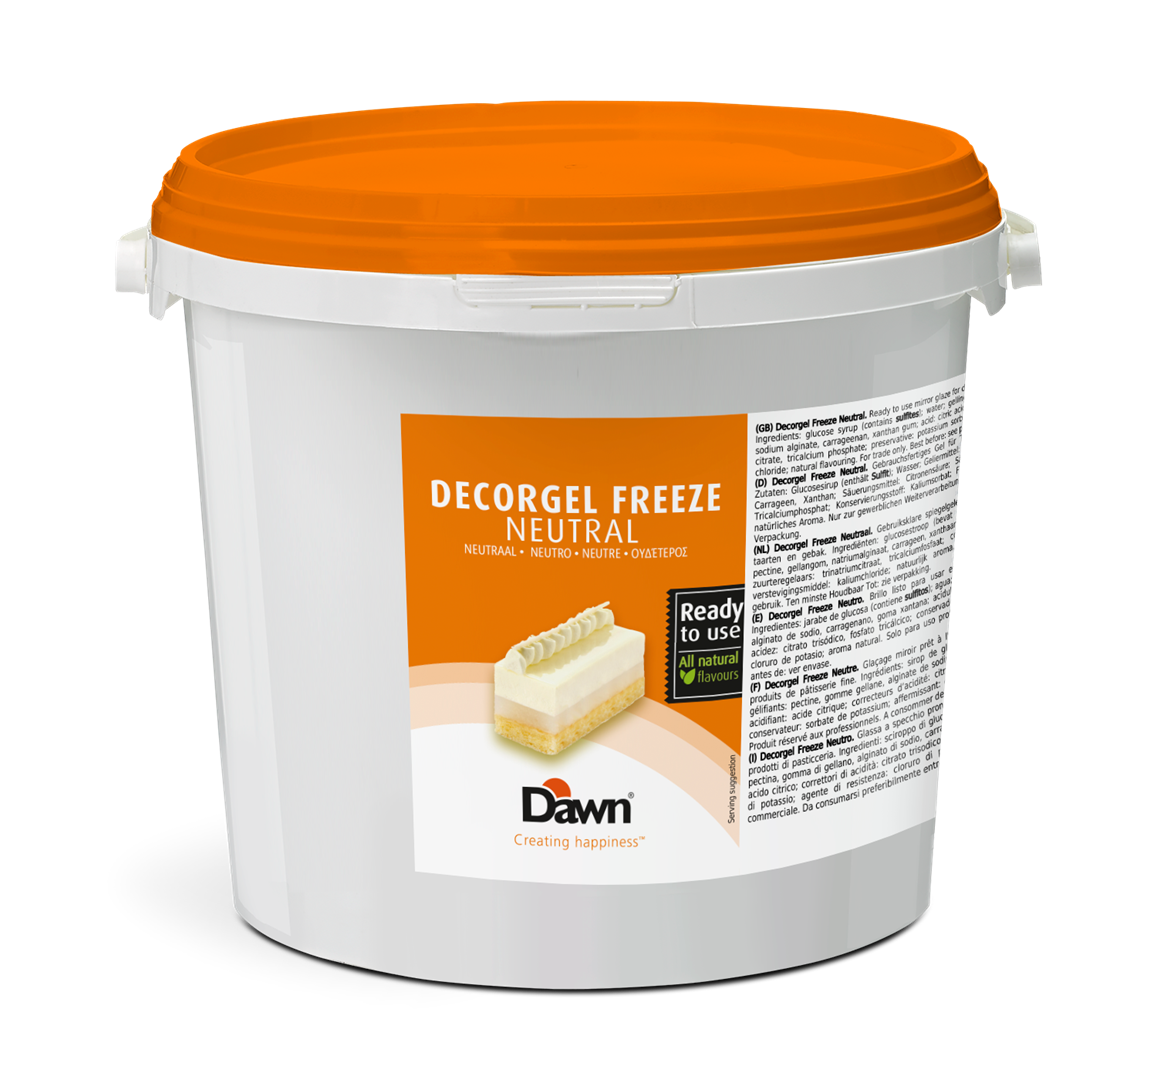 Productafbeelding Dawn Decorgel Freeze Neutraal 7 kg emmer